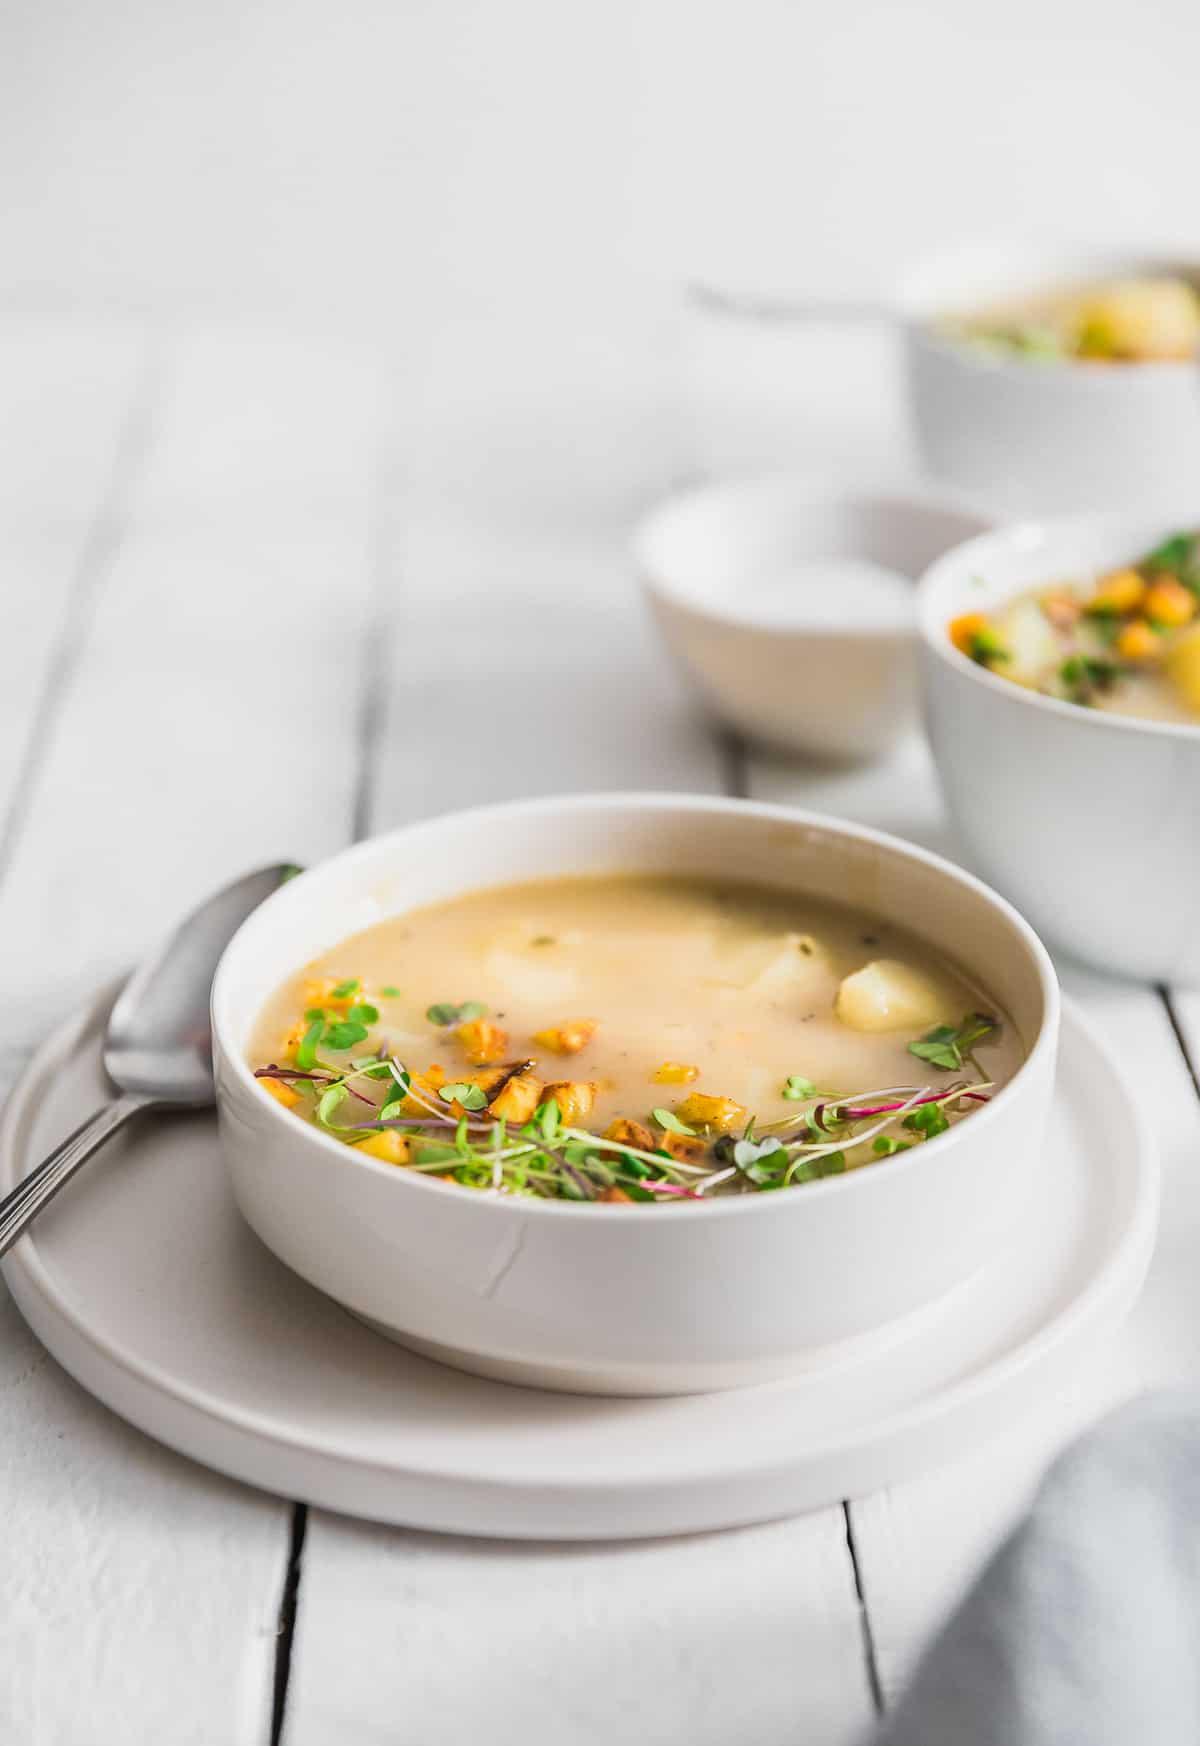 Creamy Potato Soup, plant based, vegan, vegetarian, whole food plant based, gluten free, recipe, wfpb, healthy, healthy vegan, oil free, no refined sugar, no oil, refined sugar free, dairy free, soup, potatoes